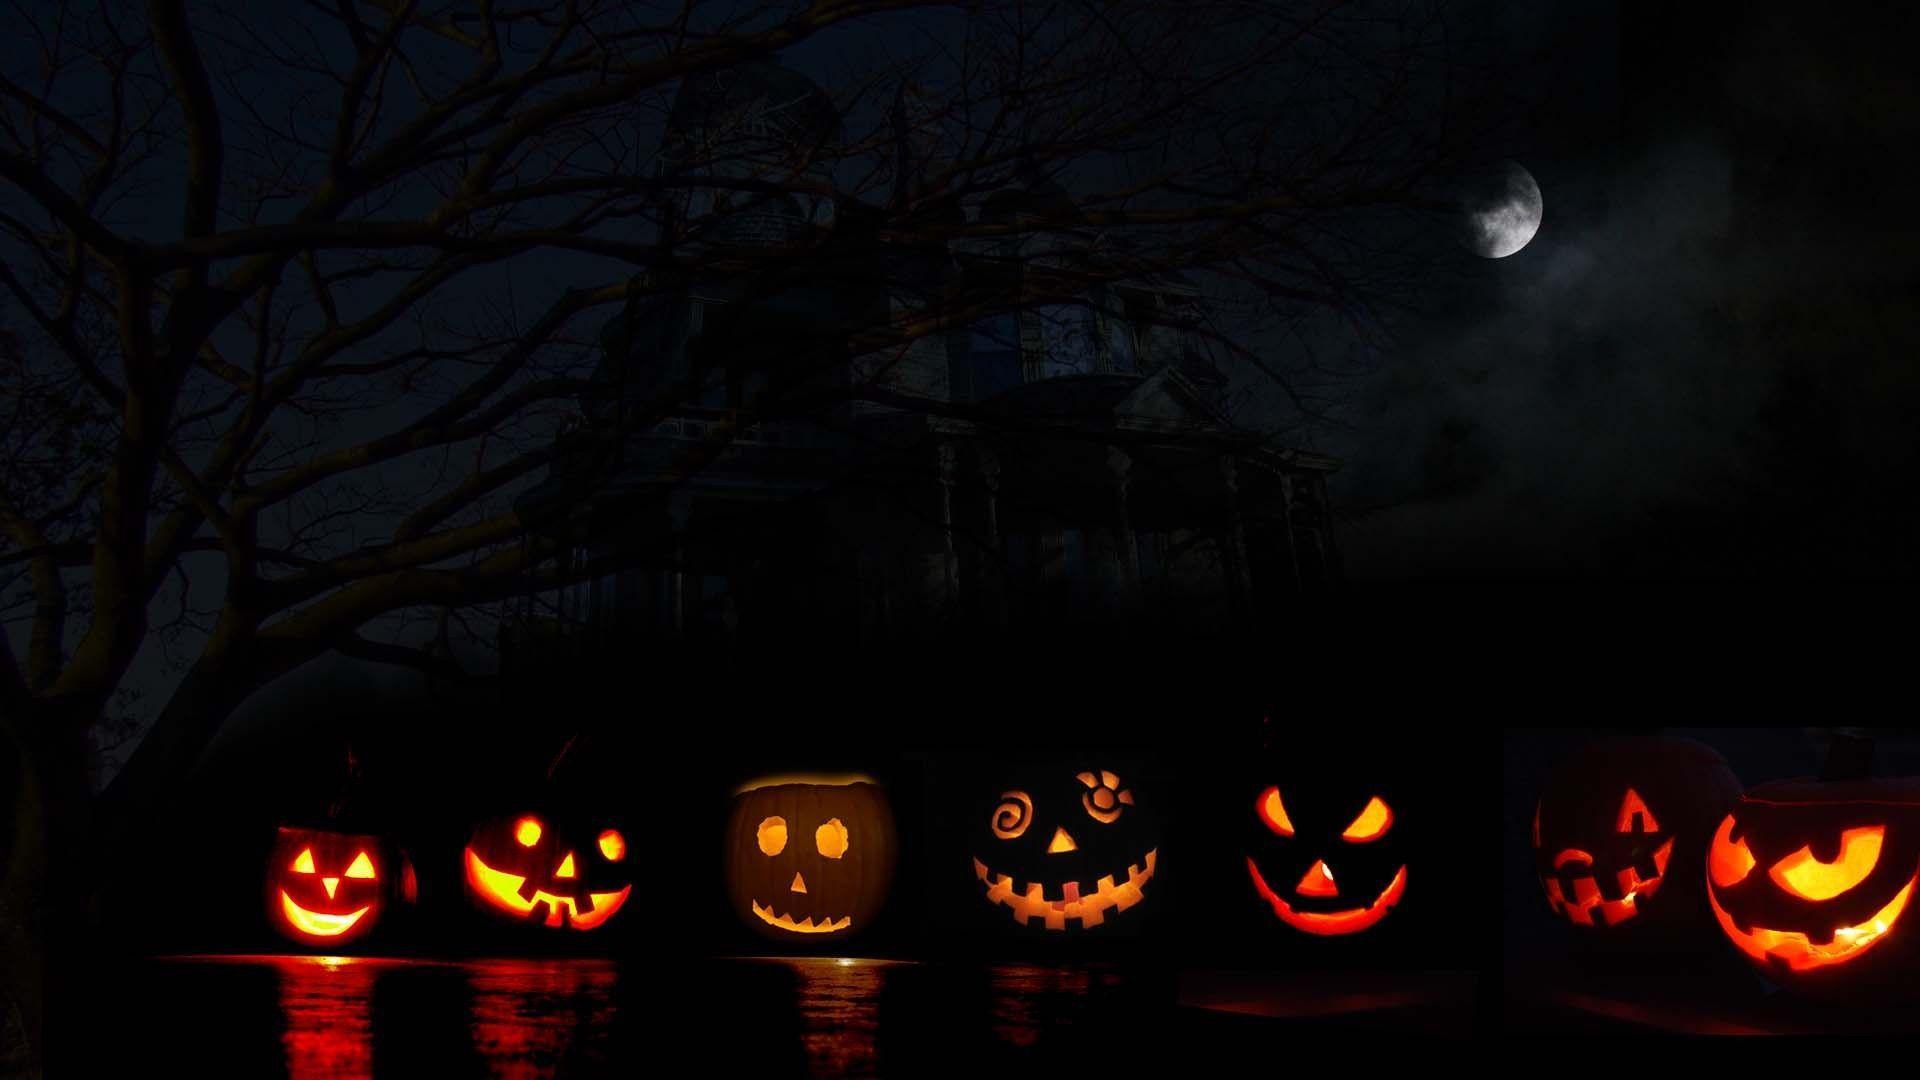 Amazing Wallpaper Mac Halloween - aHUTgXj  Pictures_432522.jpg